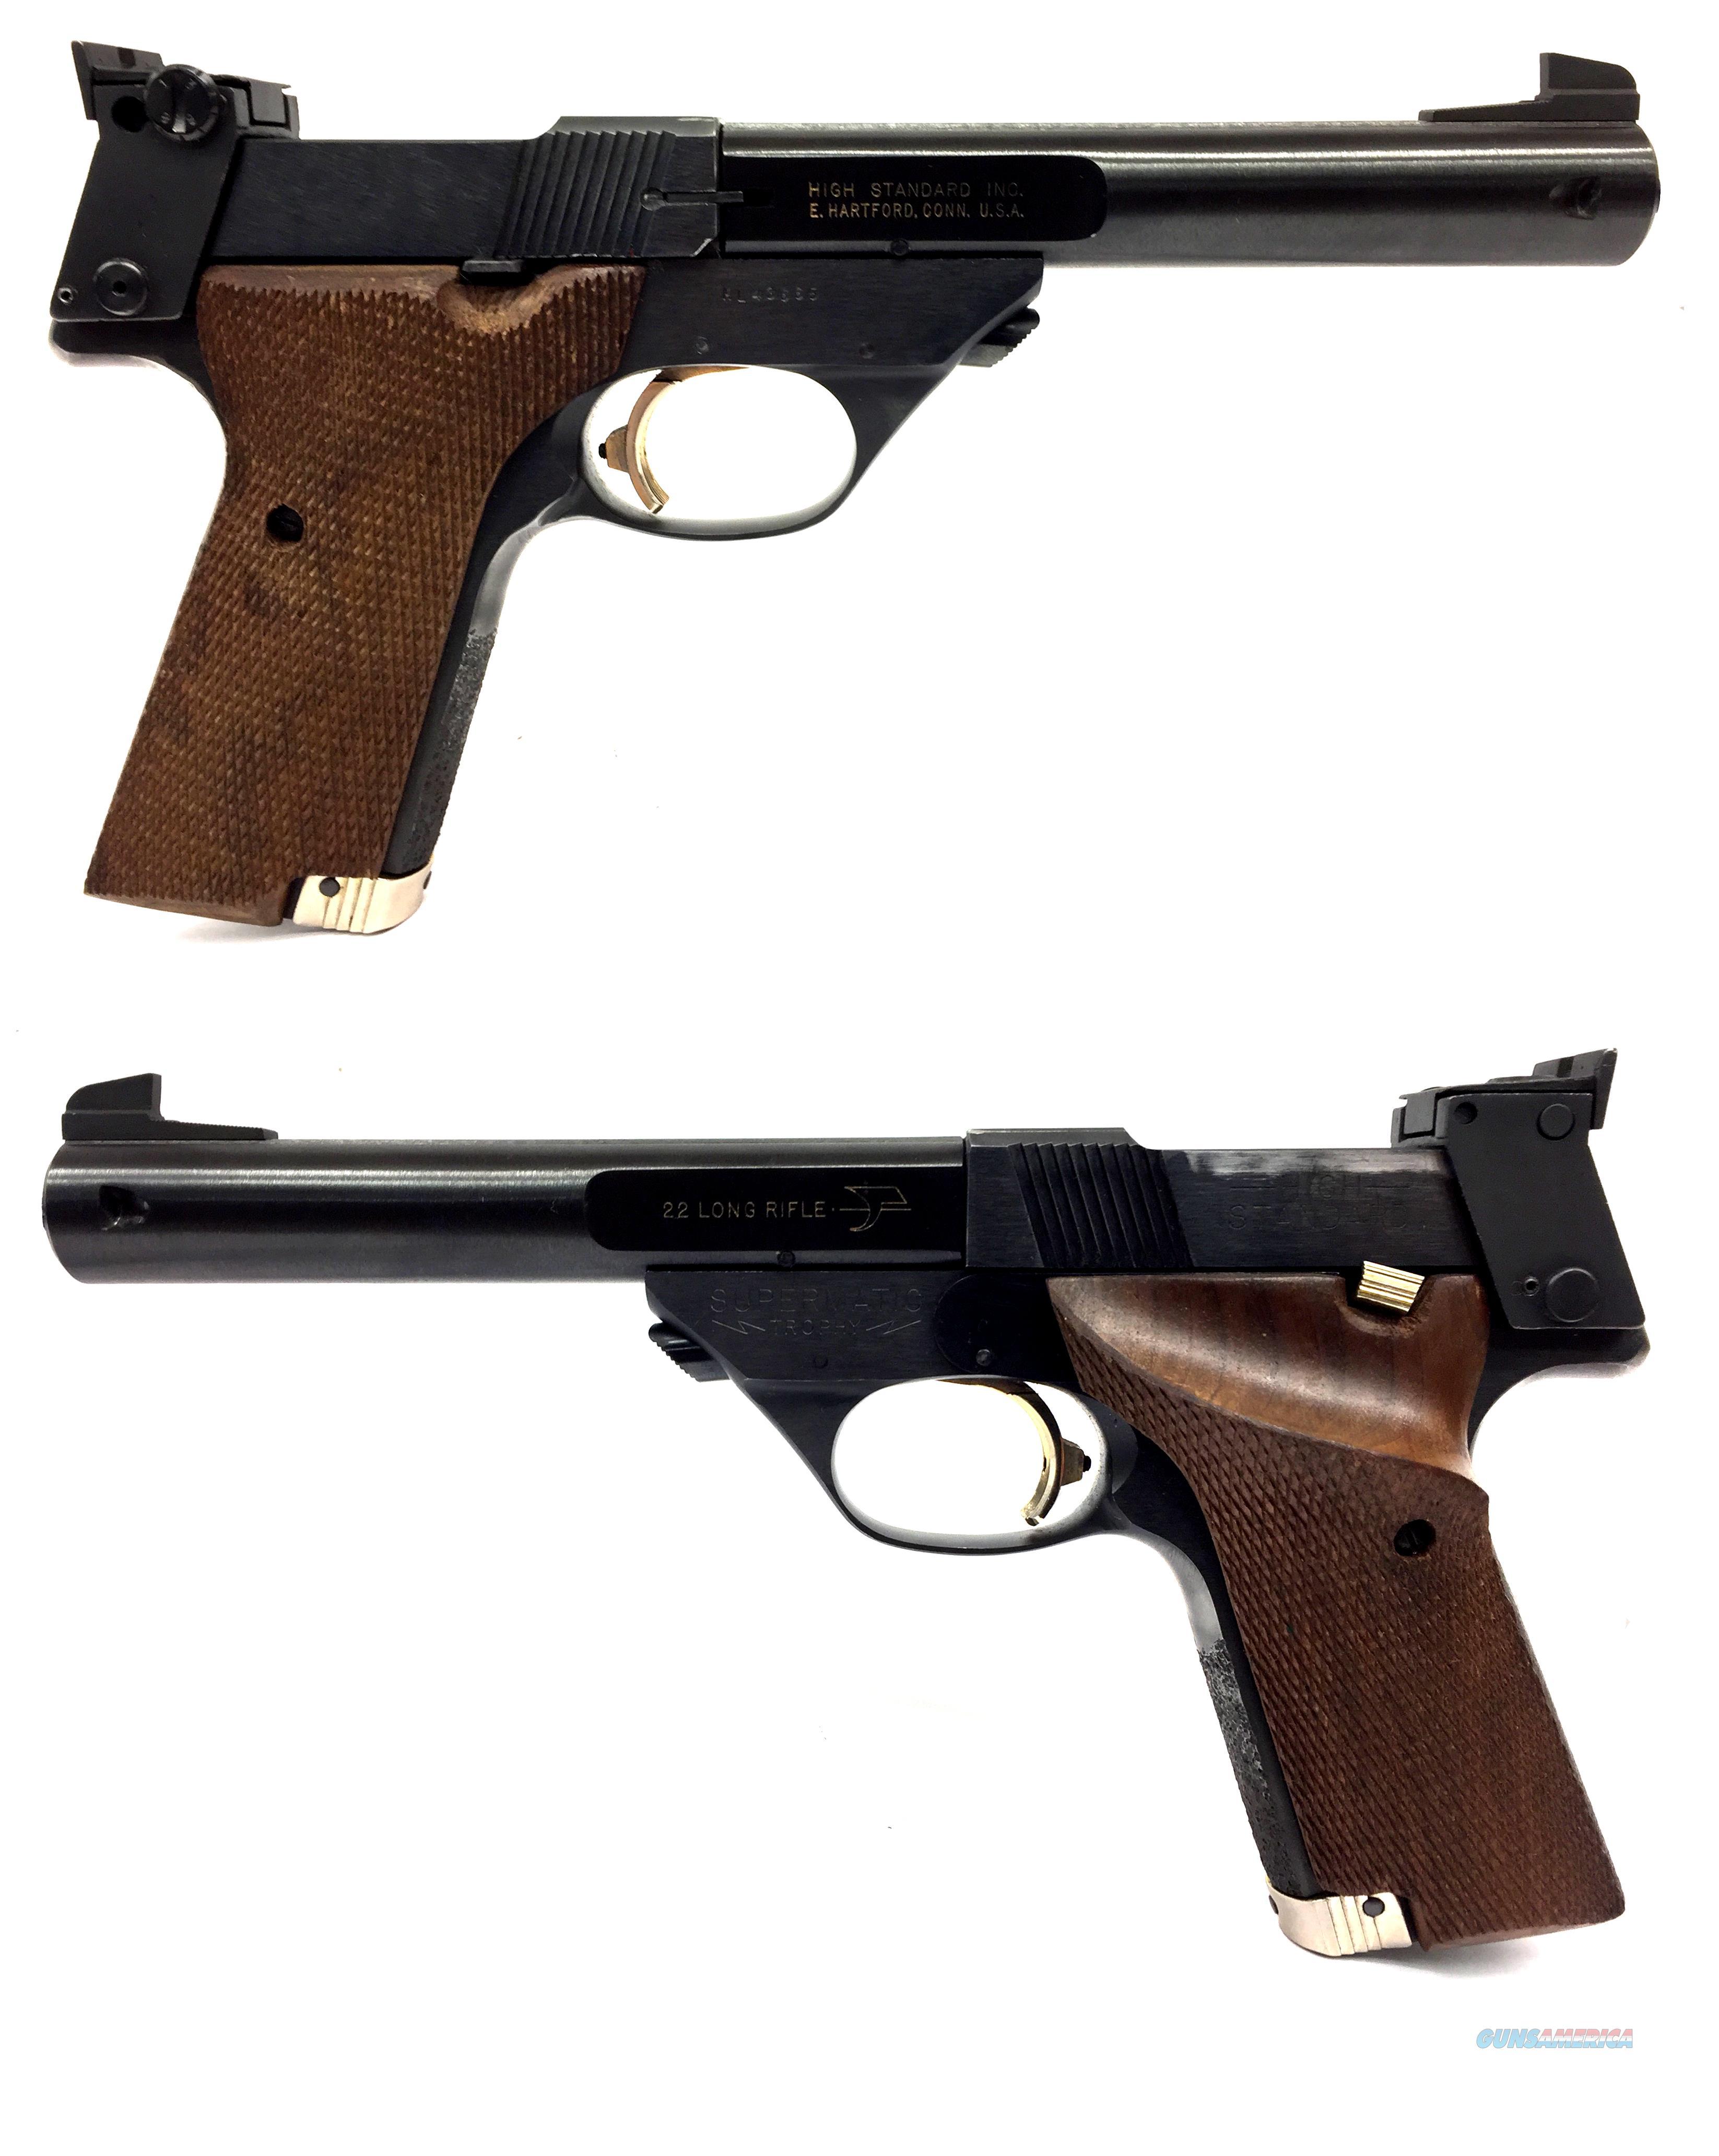 High Standard Supermatic Trophy .22LR Semi-Automatic Pistol W/ Extras  Guns > Pistols > High Standard Pistols